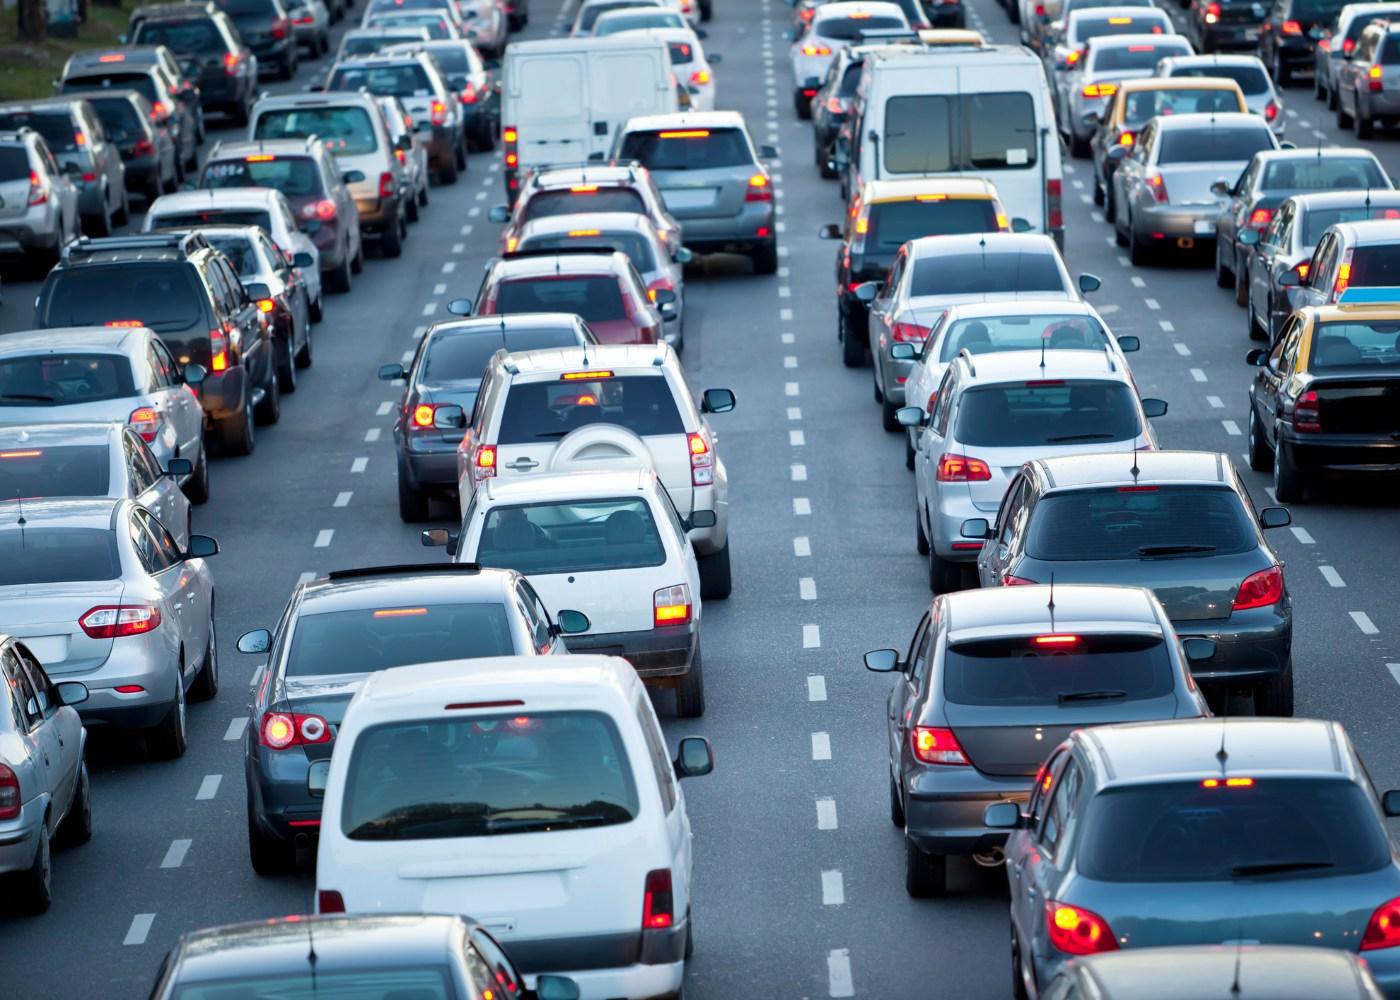 Engarrafamento de trânsito